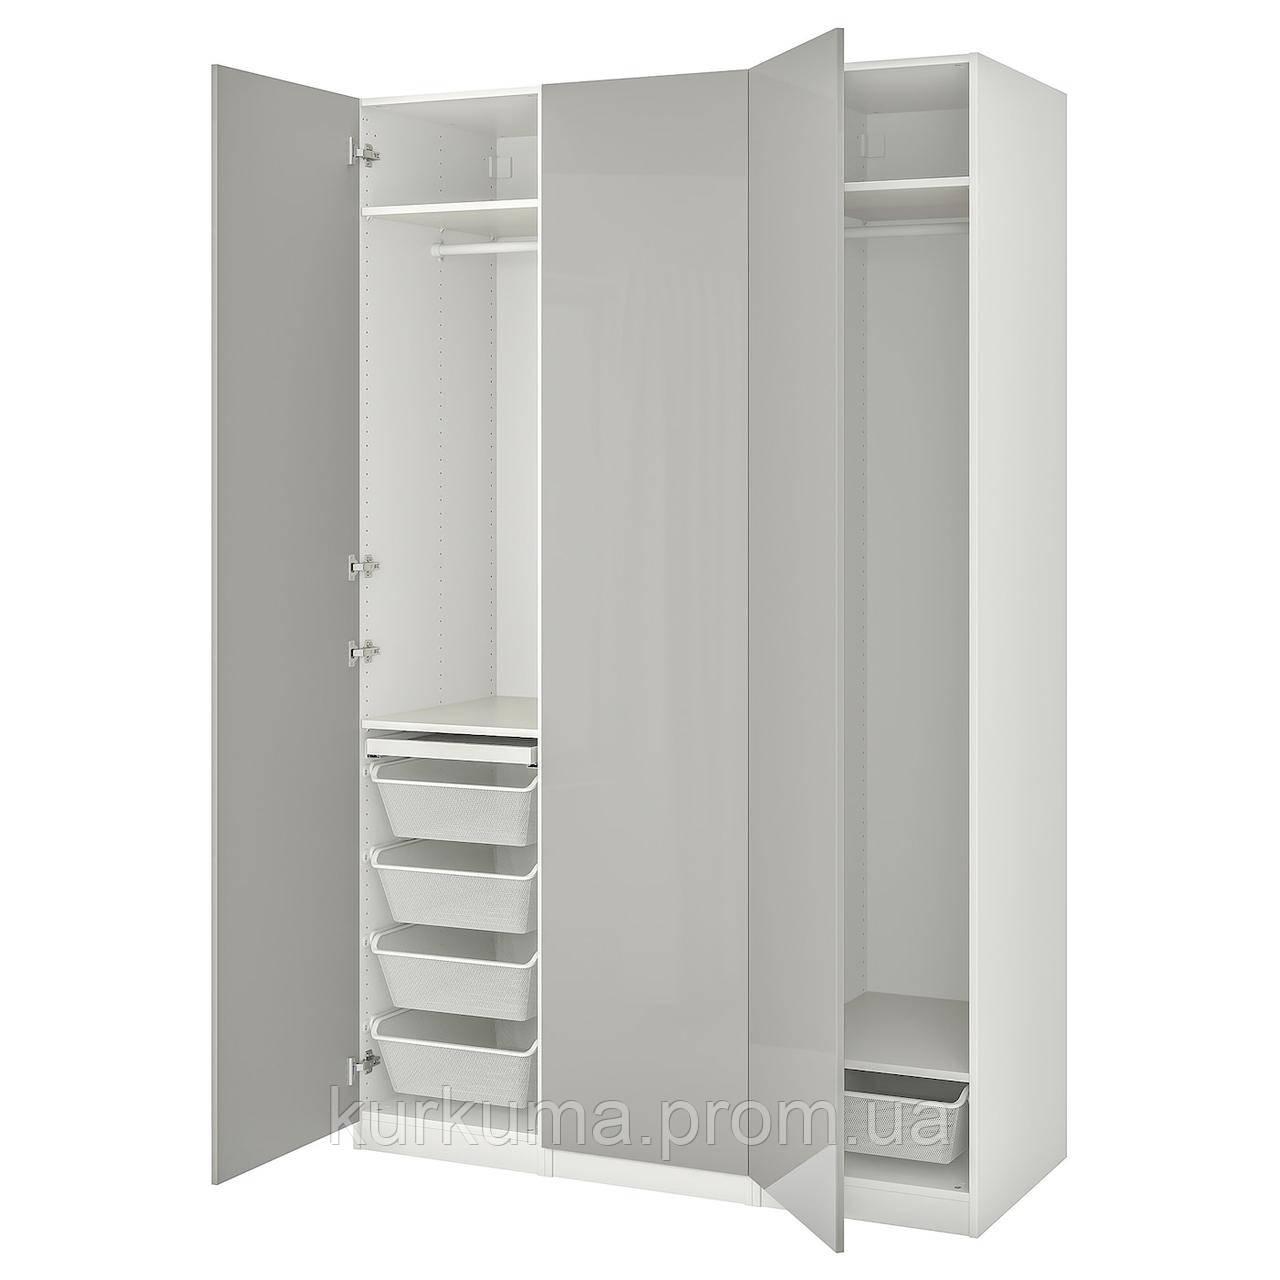 IKEA PAX / FARDAL Шкаф, белый, высокий блеск светло-серый, 150x60x236 см (493.292.13)